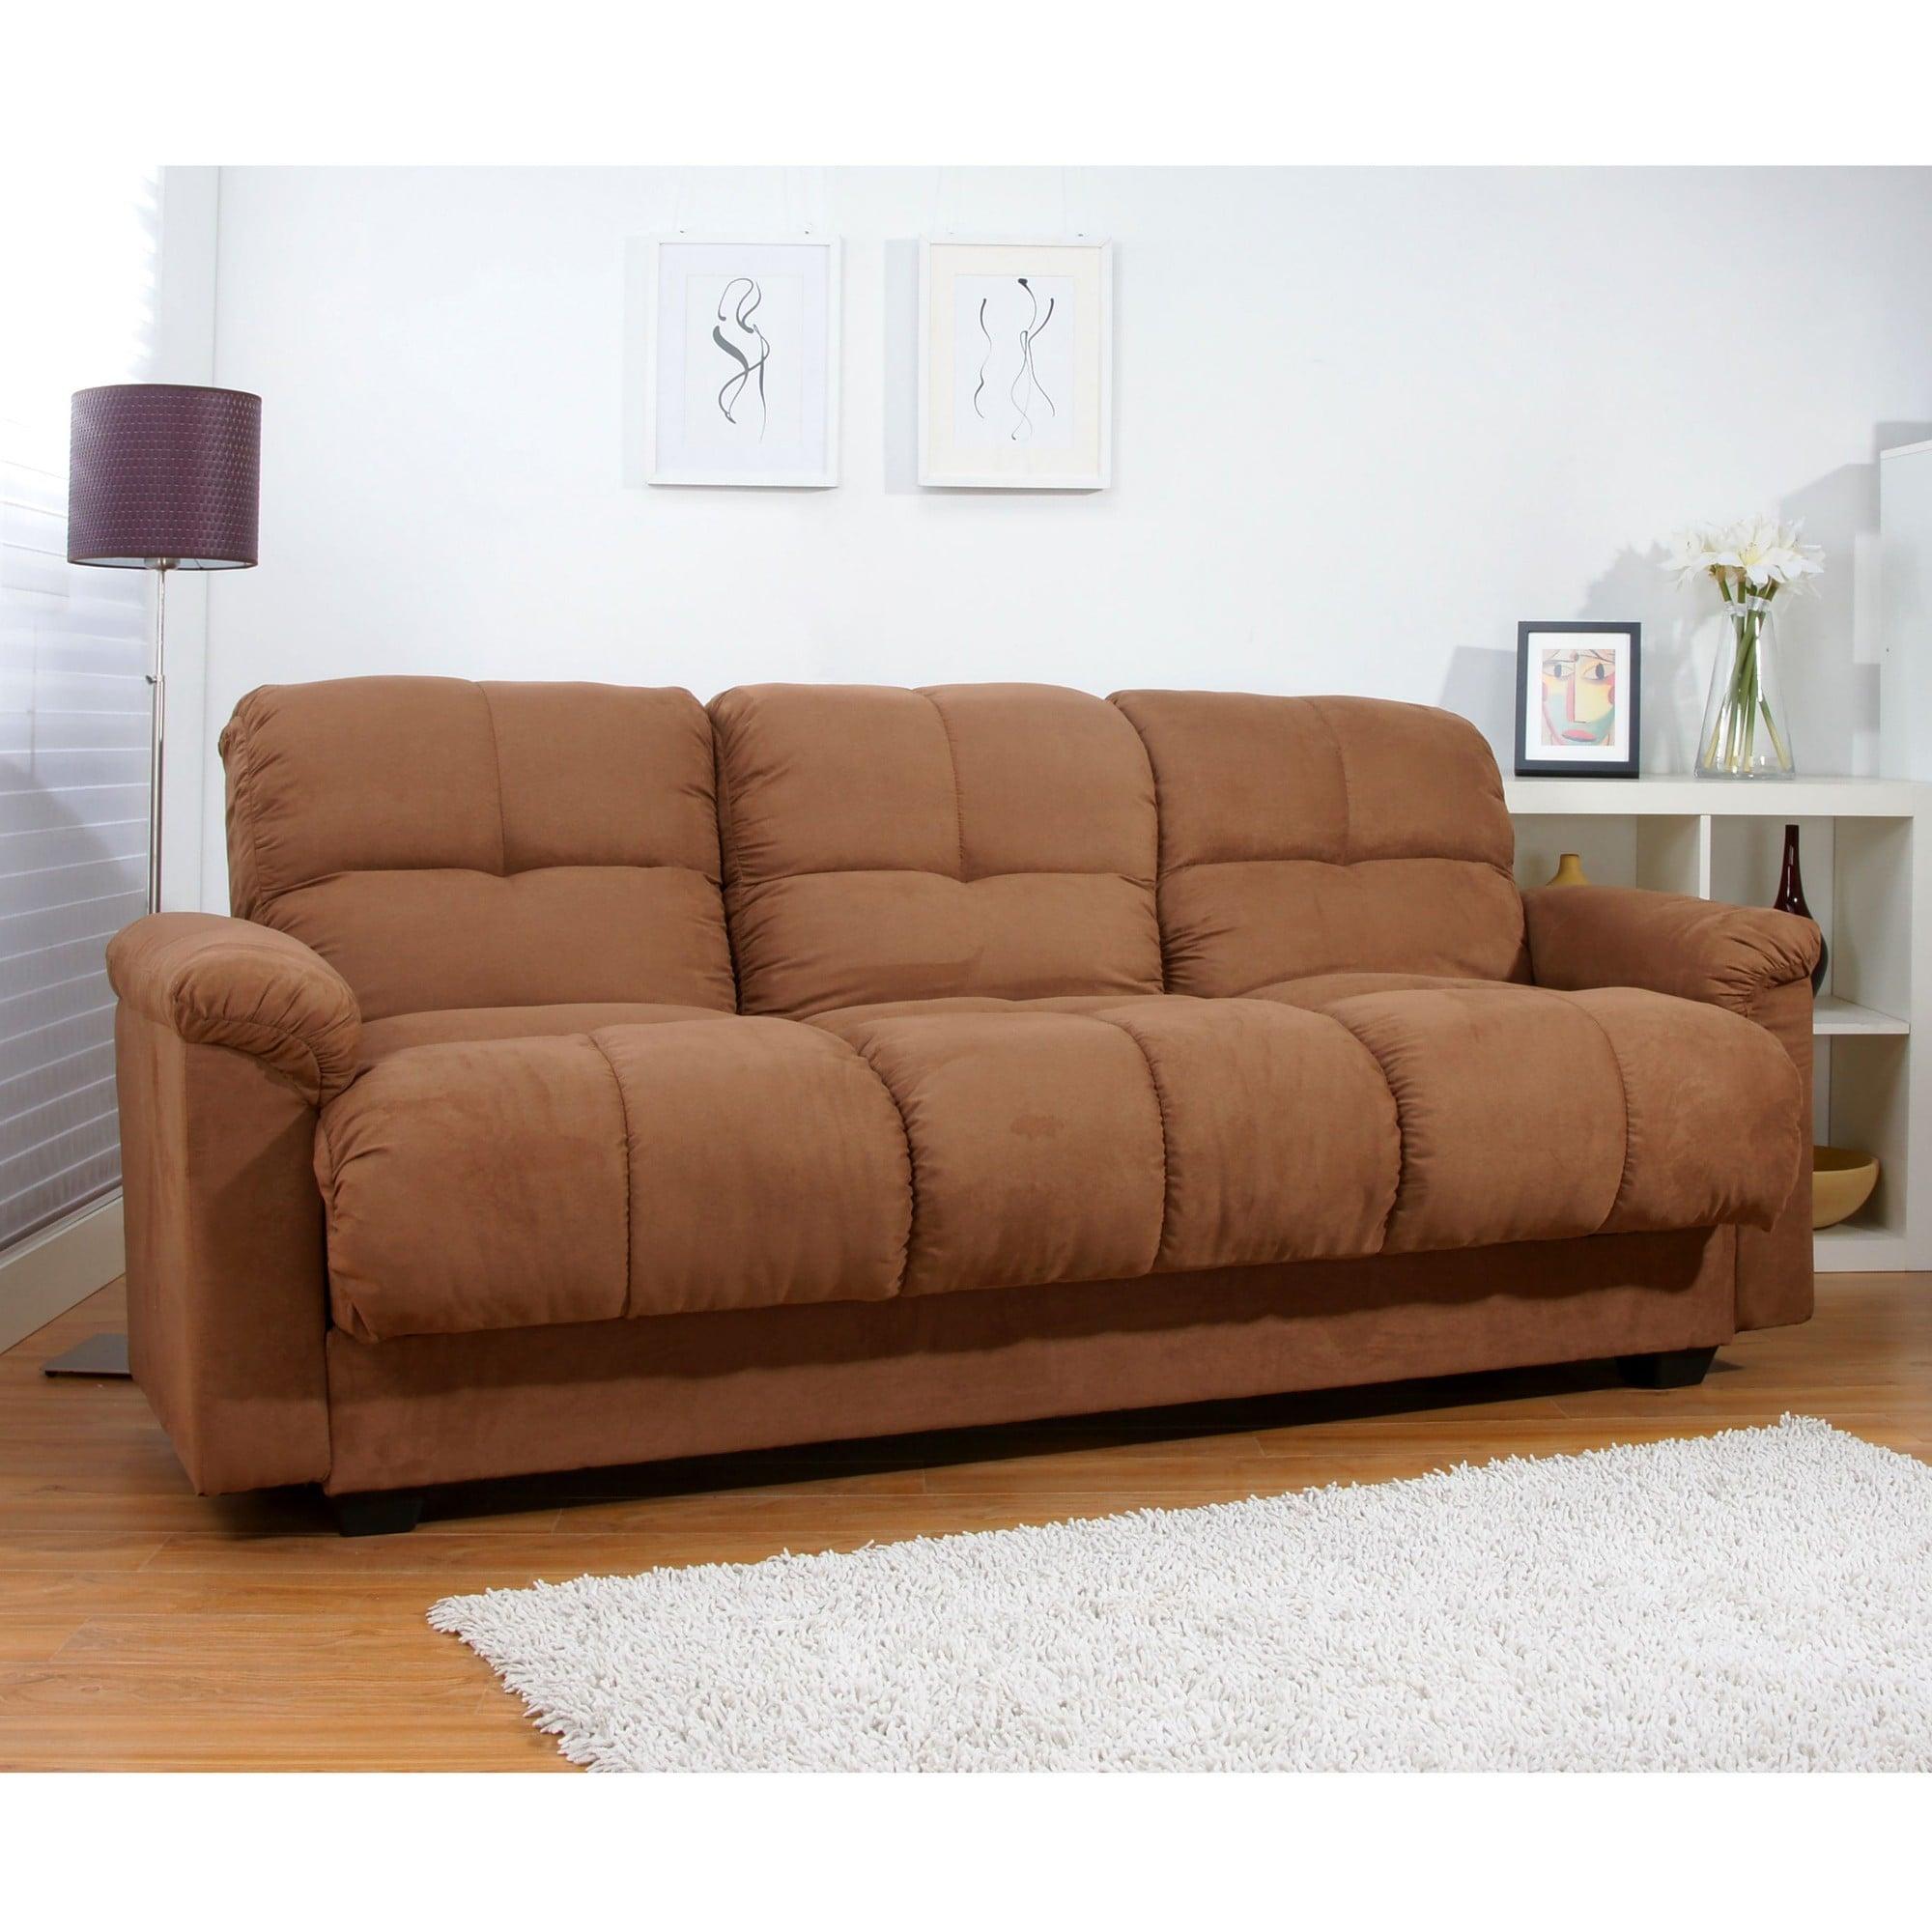 - Shop Multifunctional Microsuede Mocha Storage Sleeper Sofa Bed